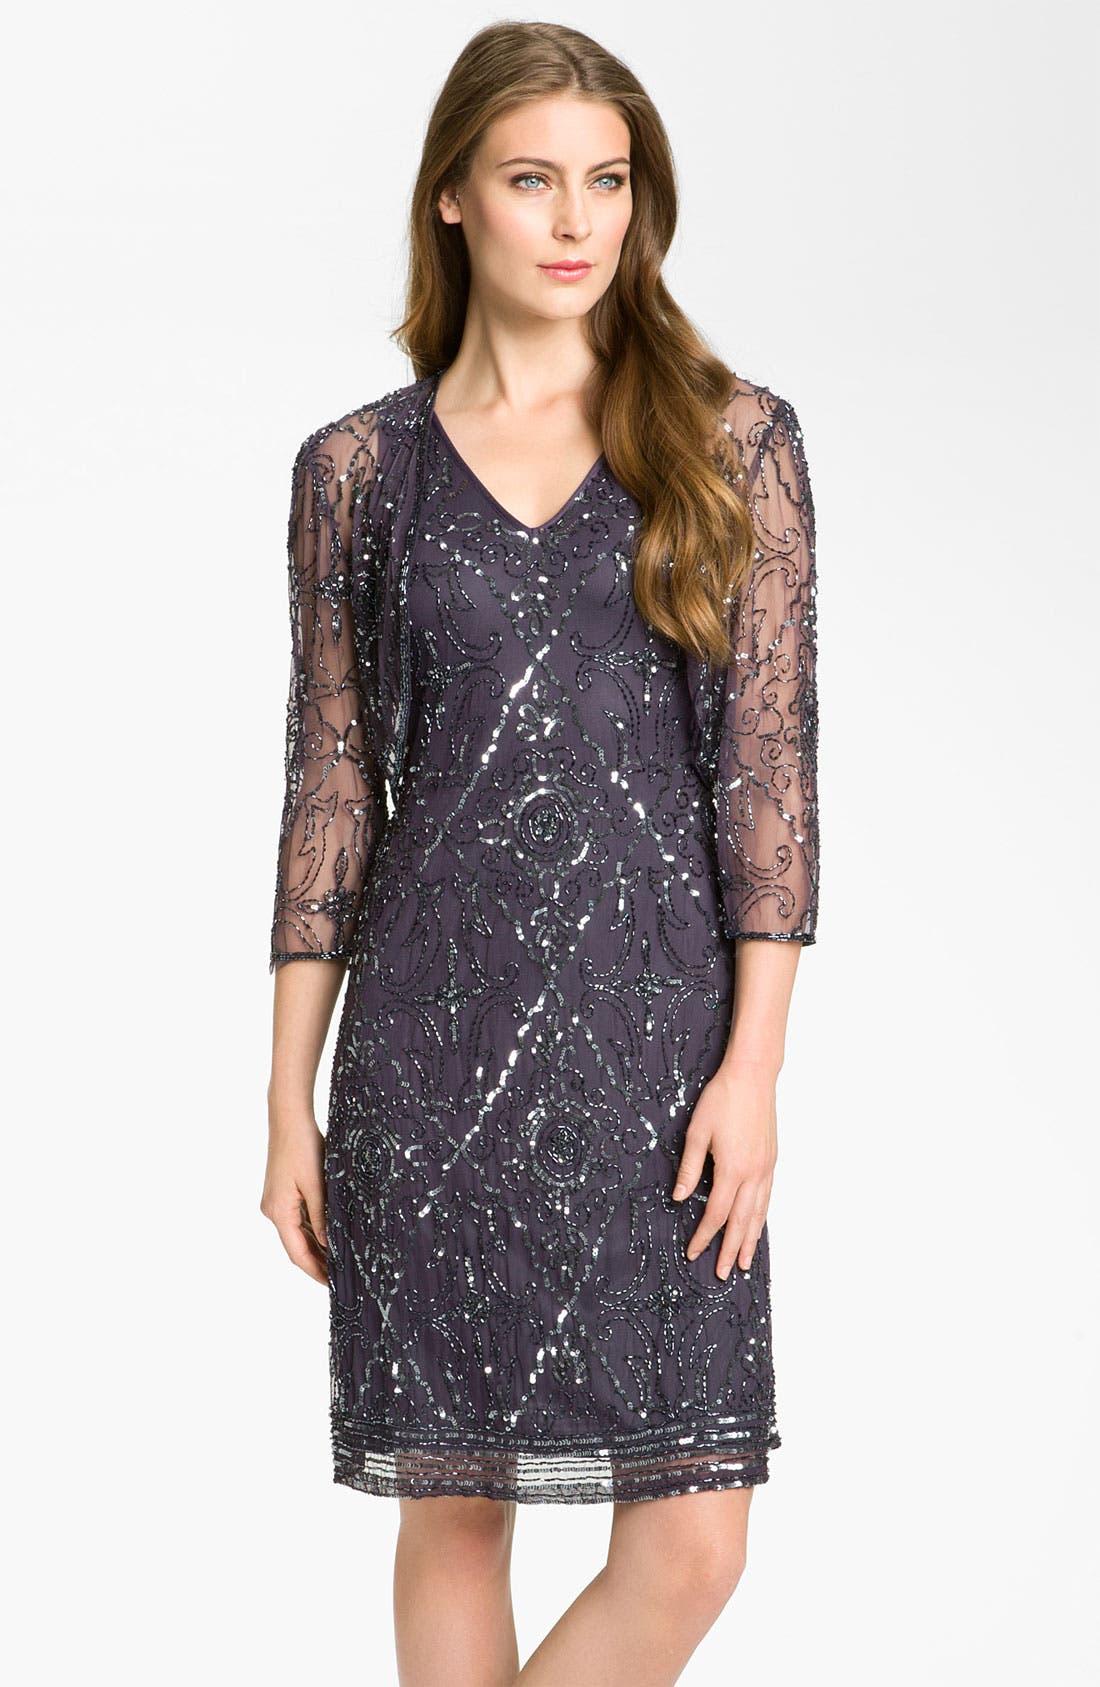 Main Image - Patra Beaded Mesh Dress & Bolero